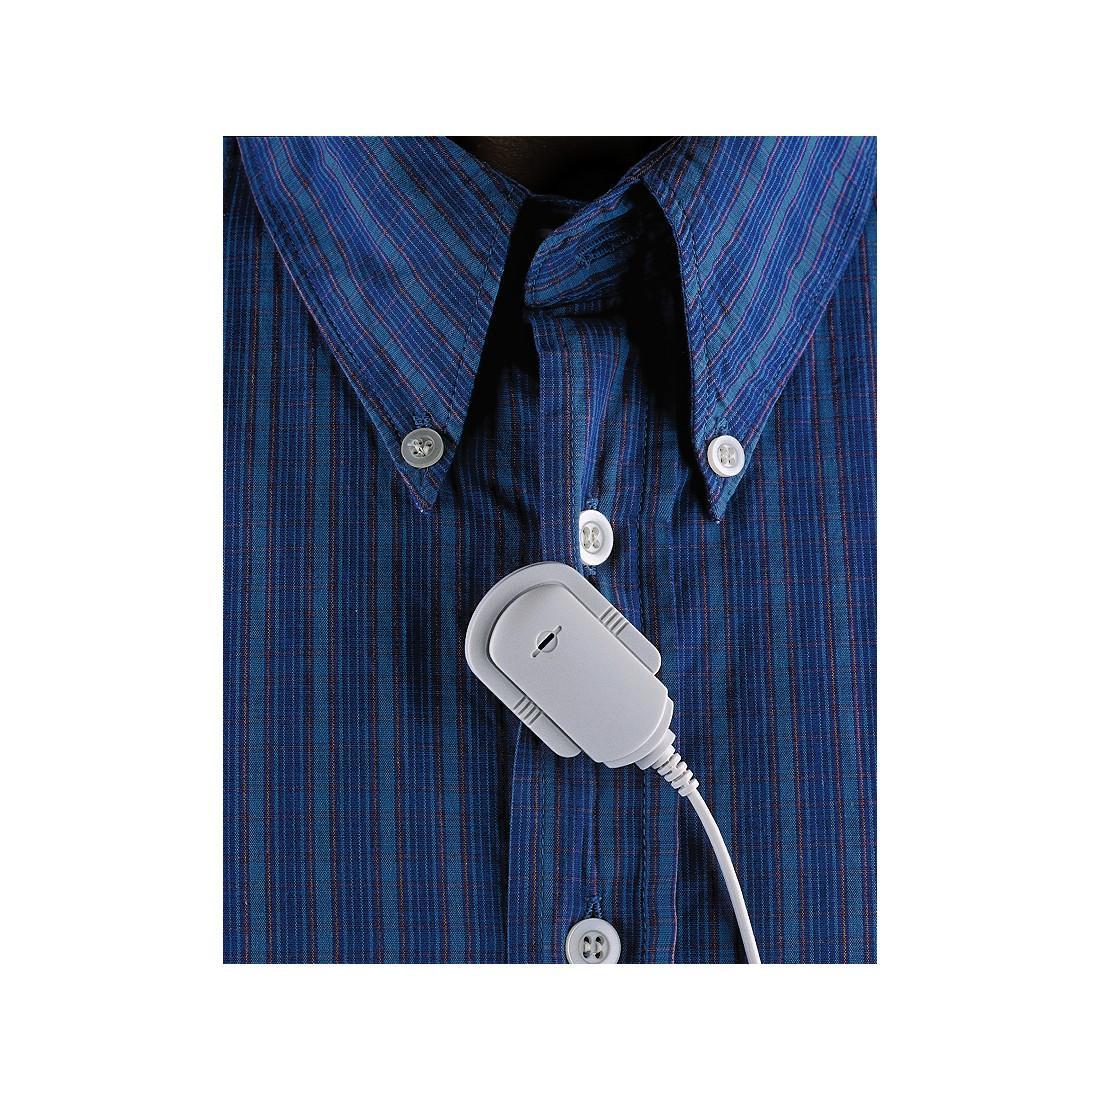 Микрофон за ревер или монитор HAMA CS-460, 3.5мм